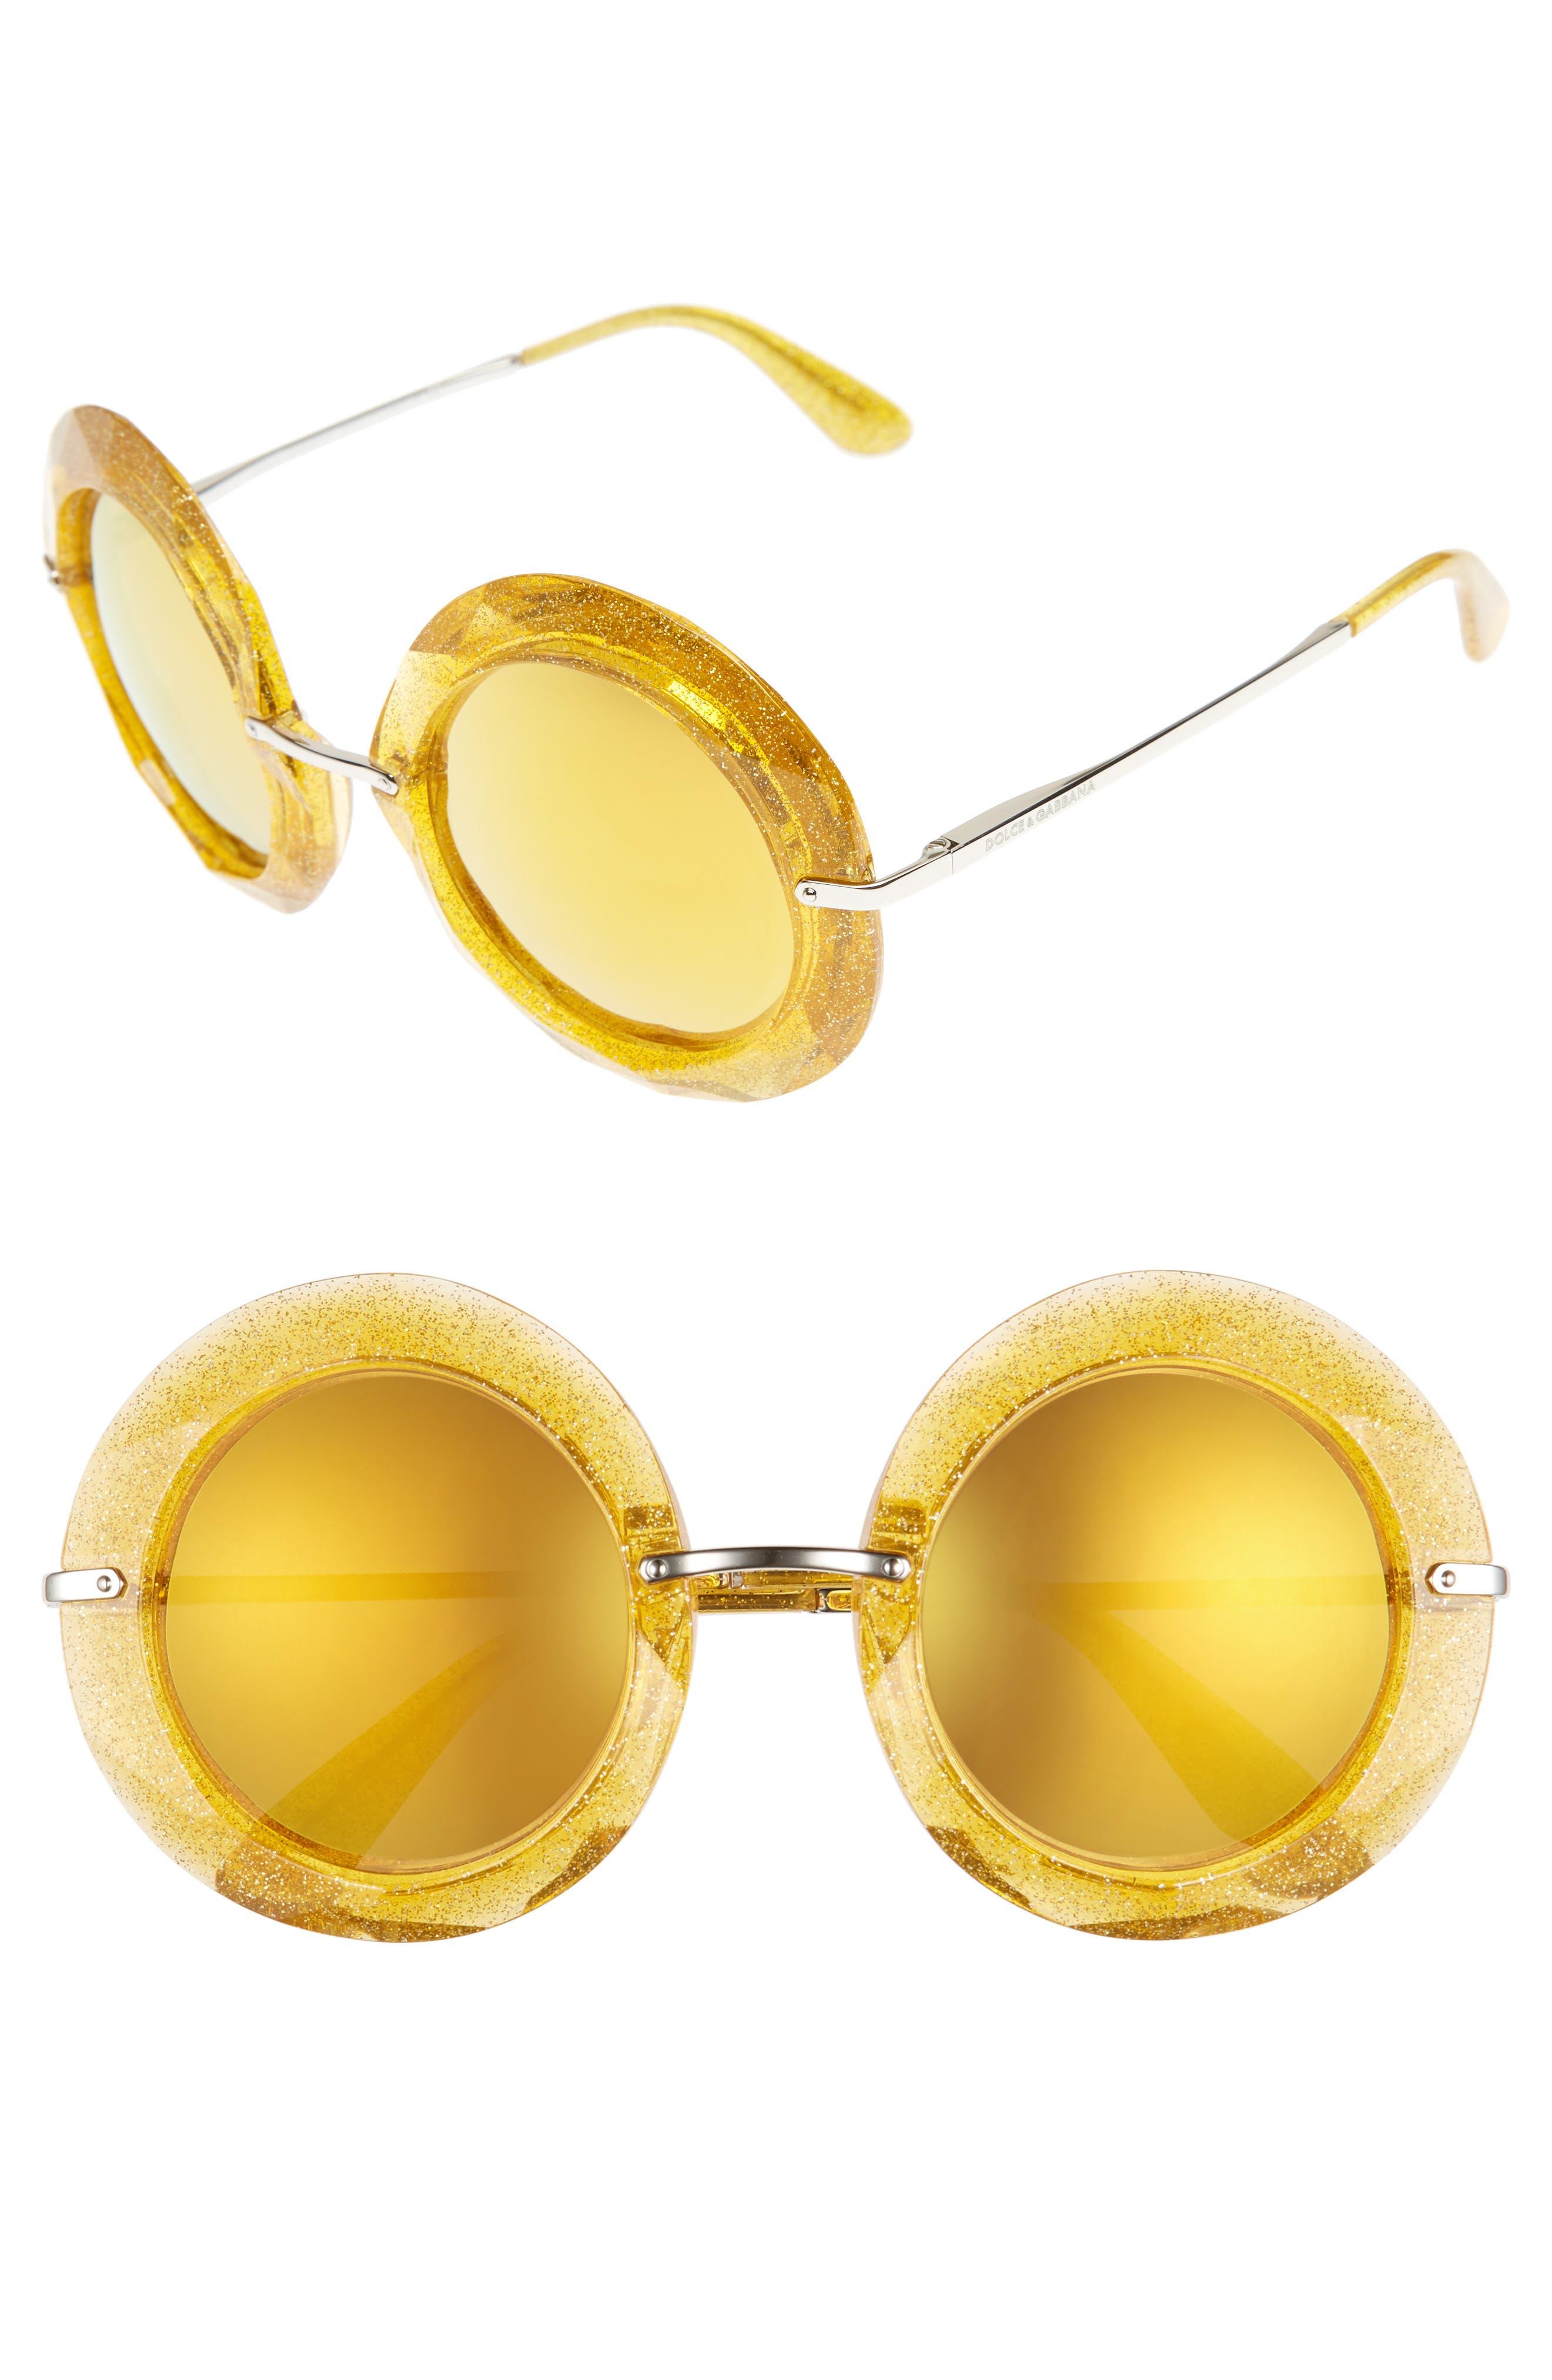 Dolce&Gabbana 50mm Round Sunglasses